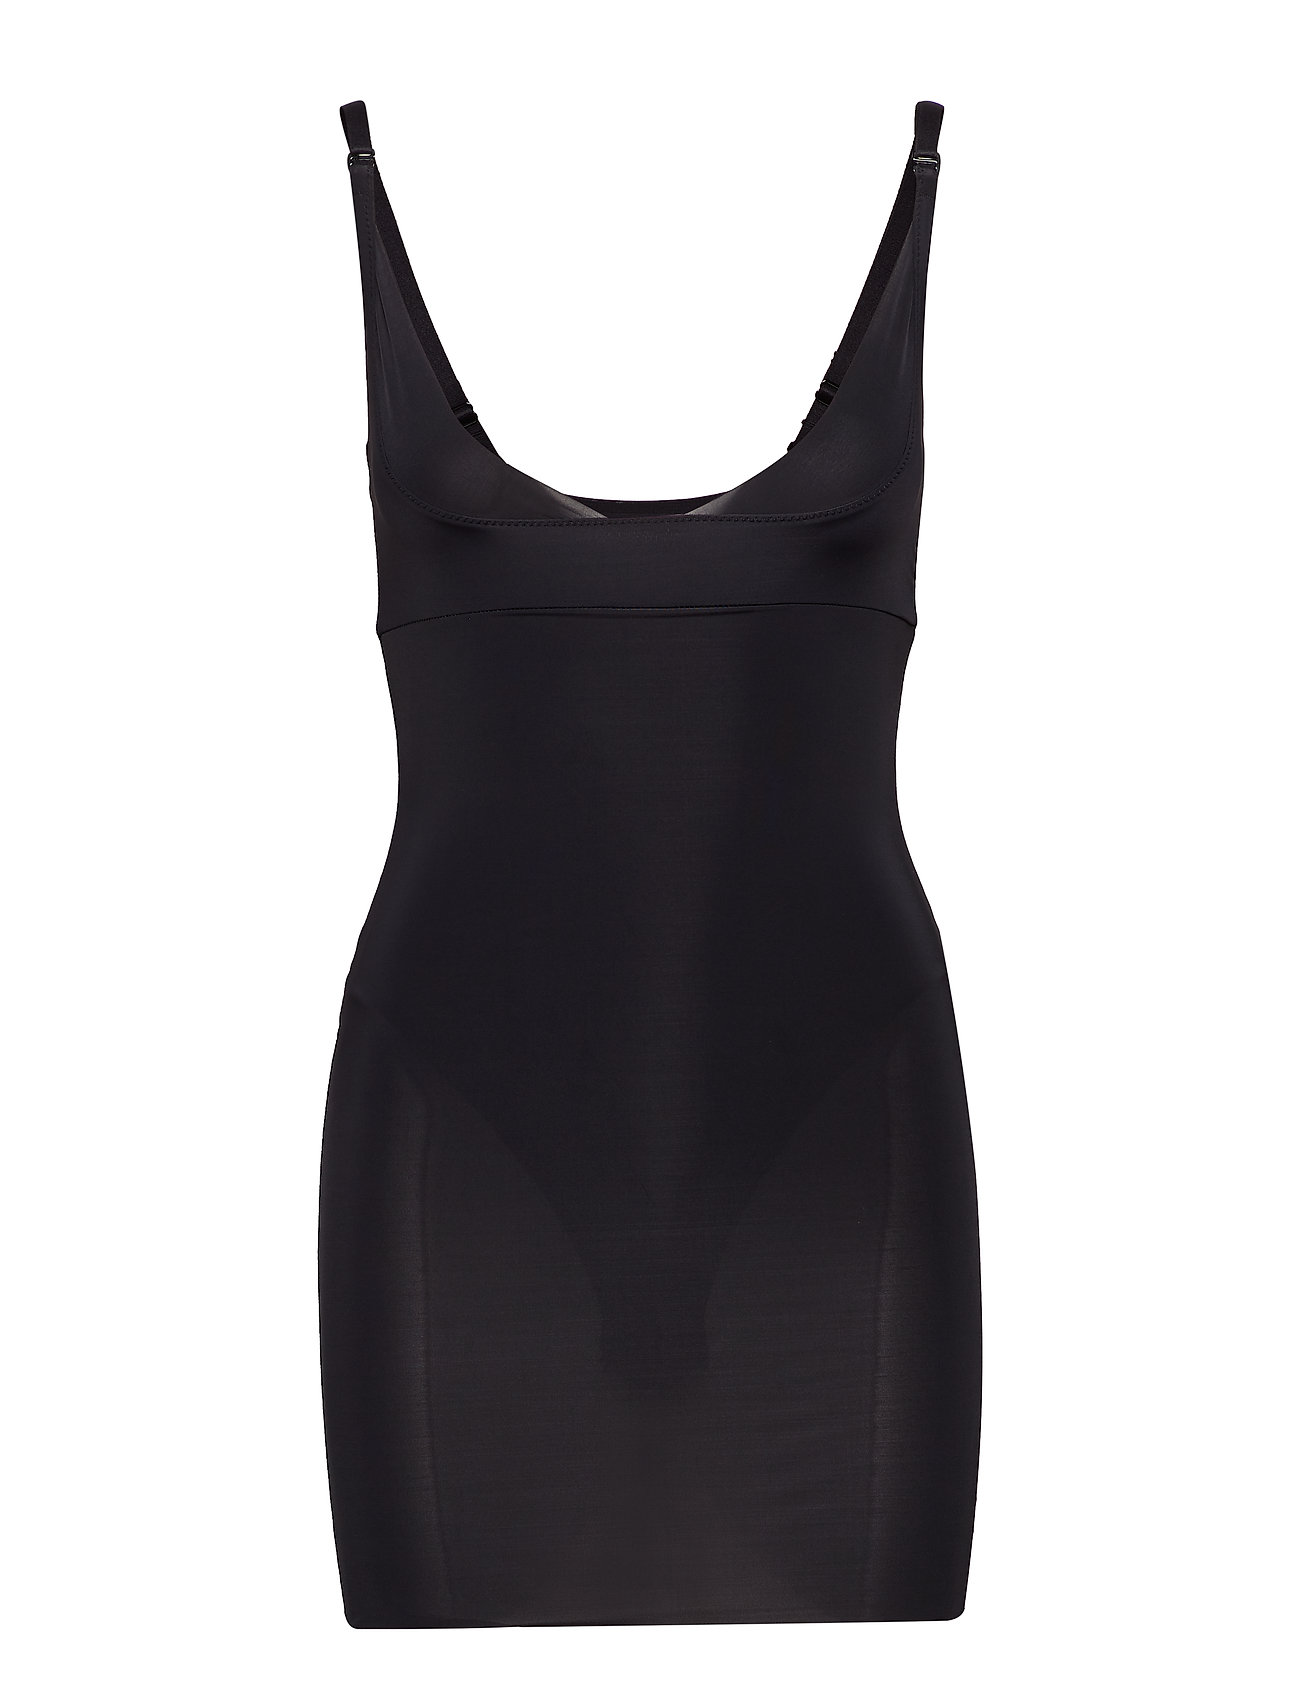 Shapewear Dress - Decoy